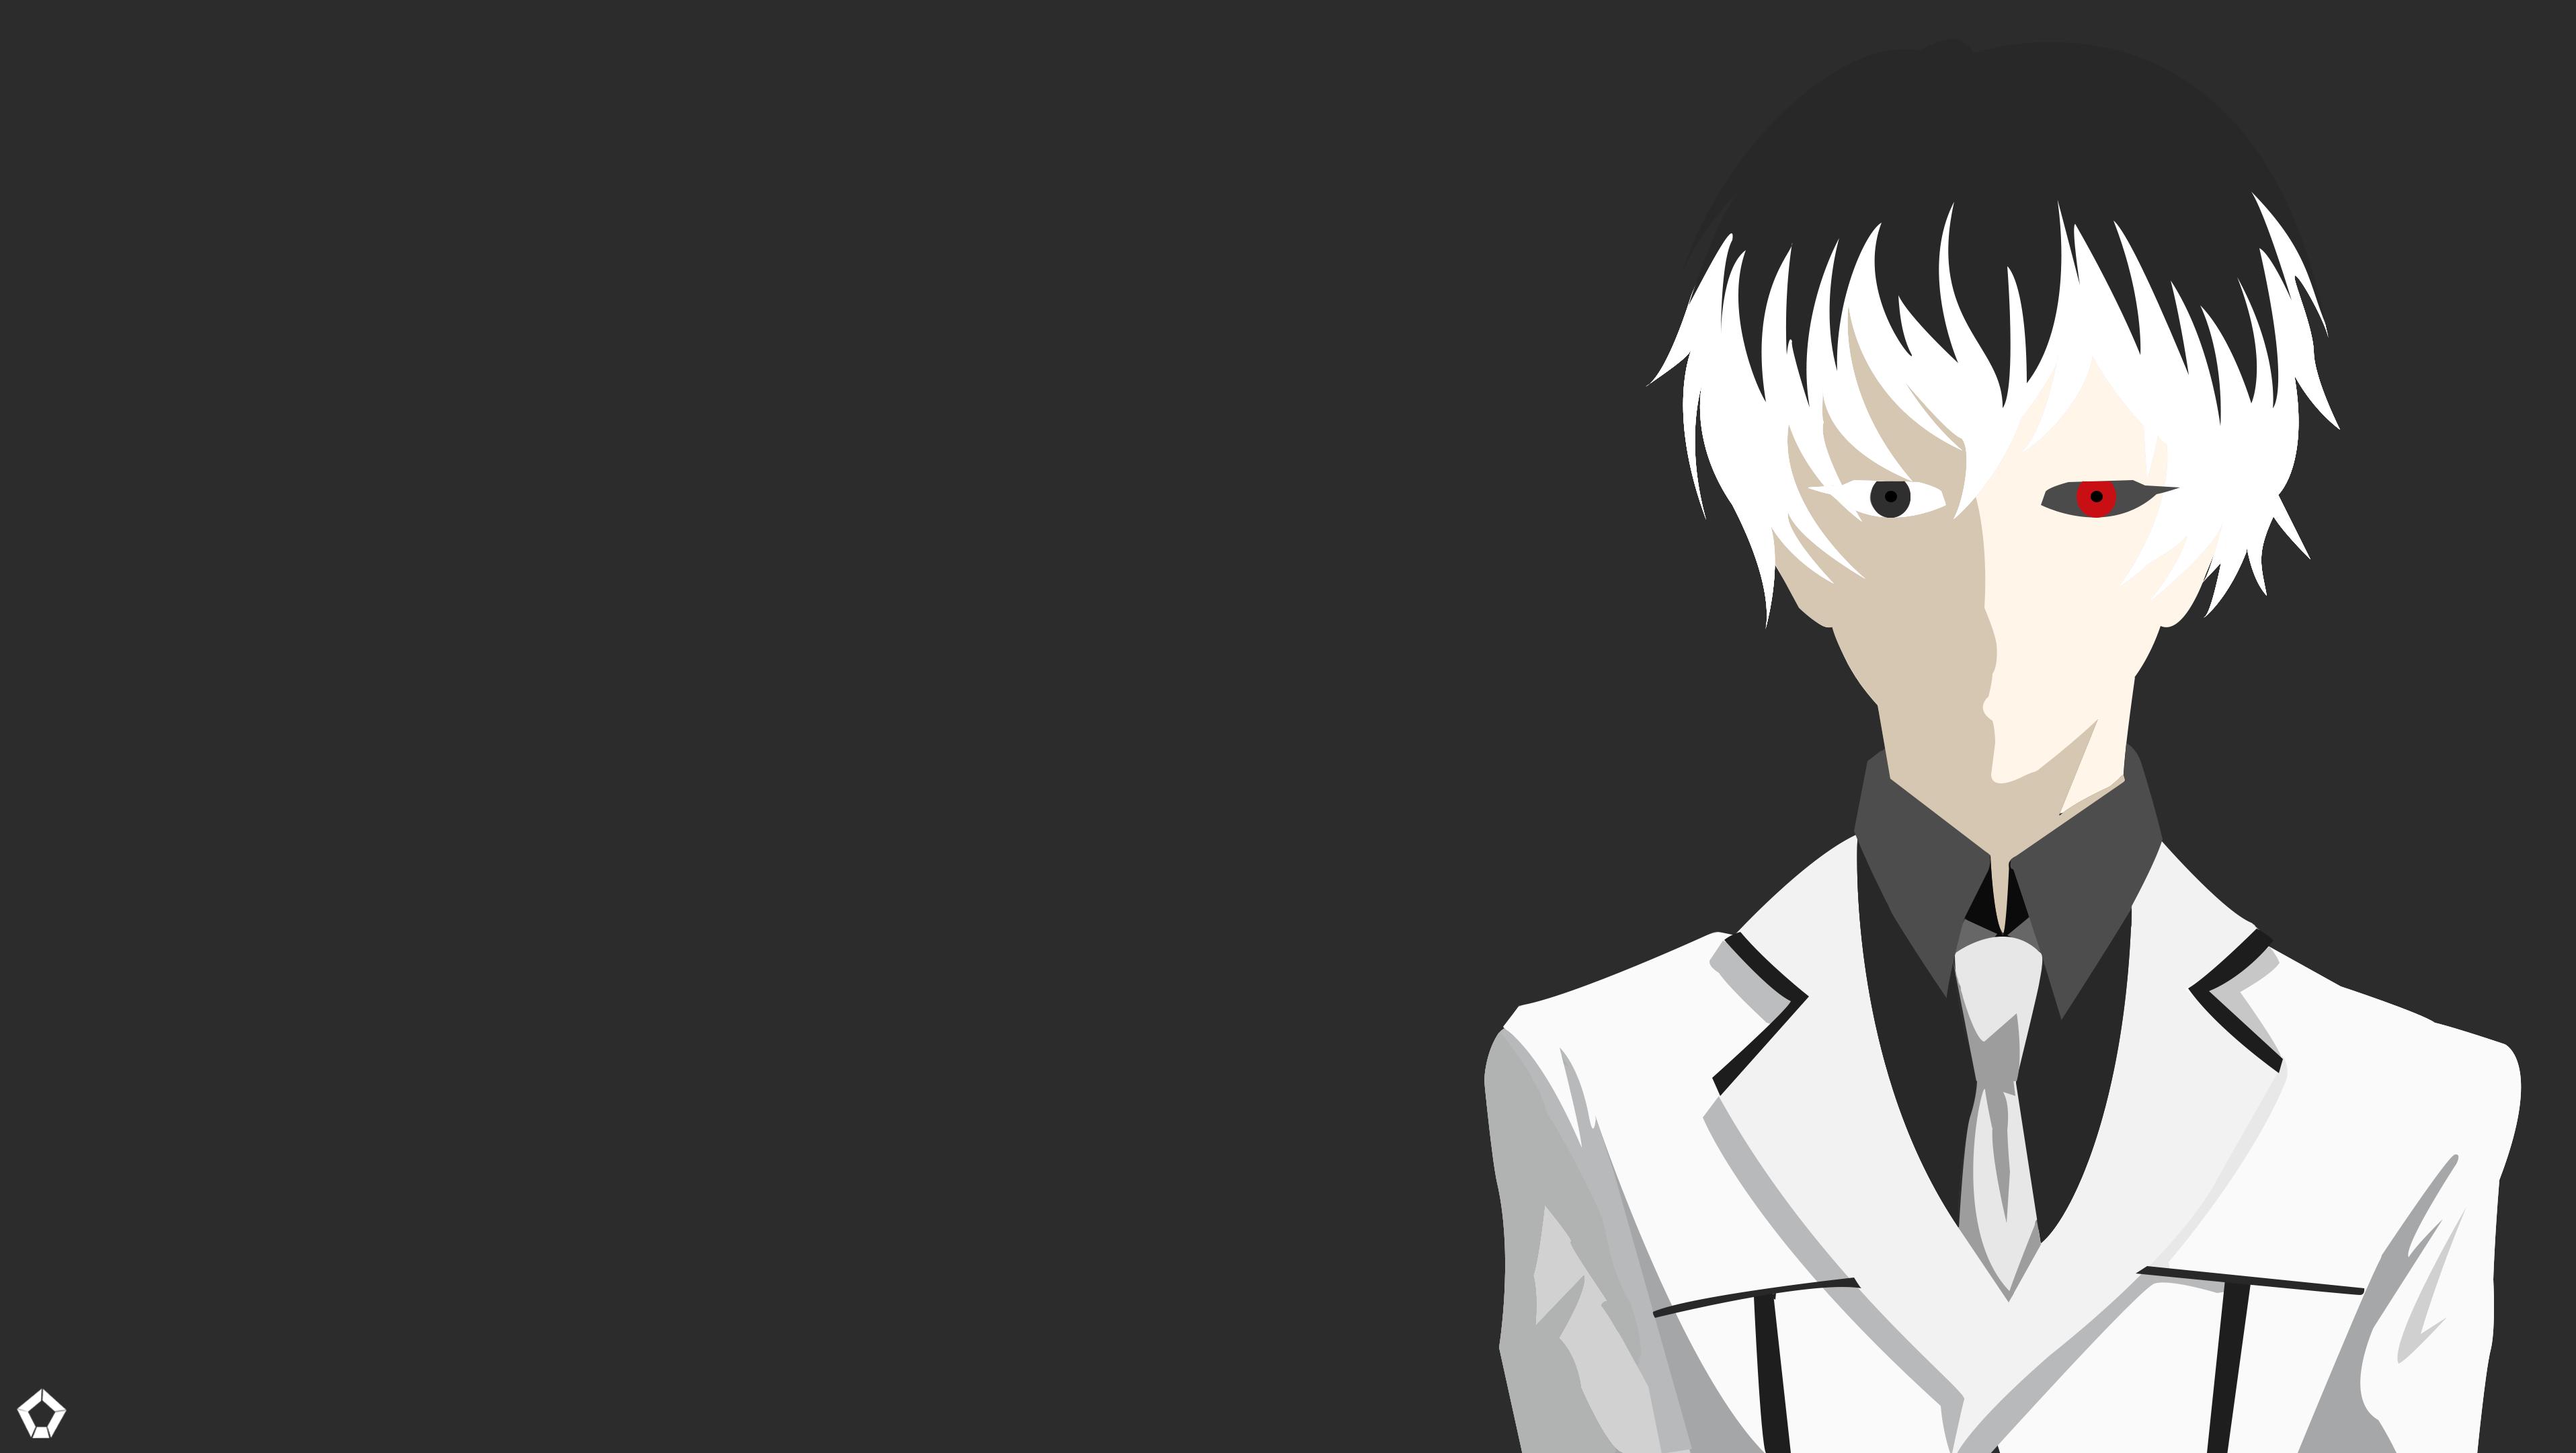 Kaneki Ken|Tokyo Ghoul| Minimalist Wallpaper by Darkfate17